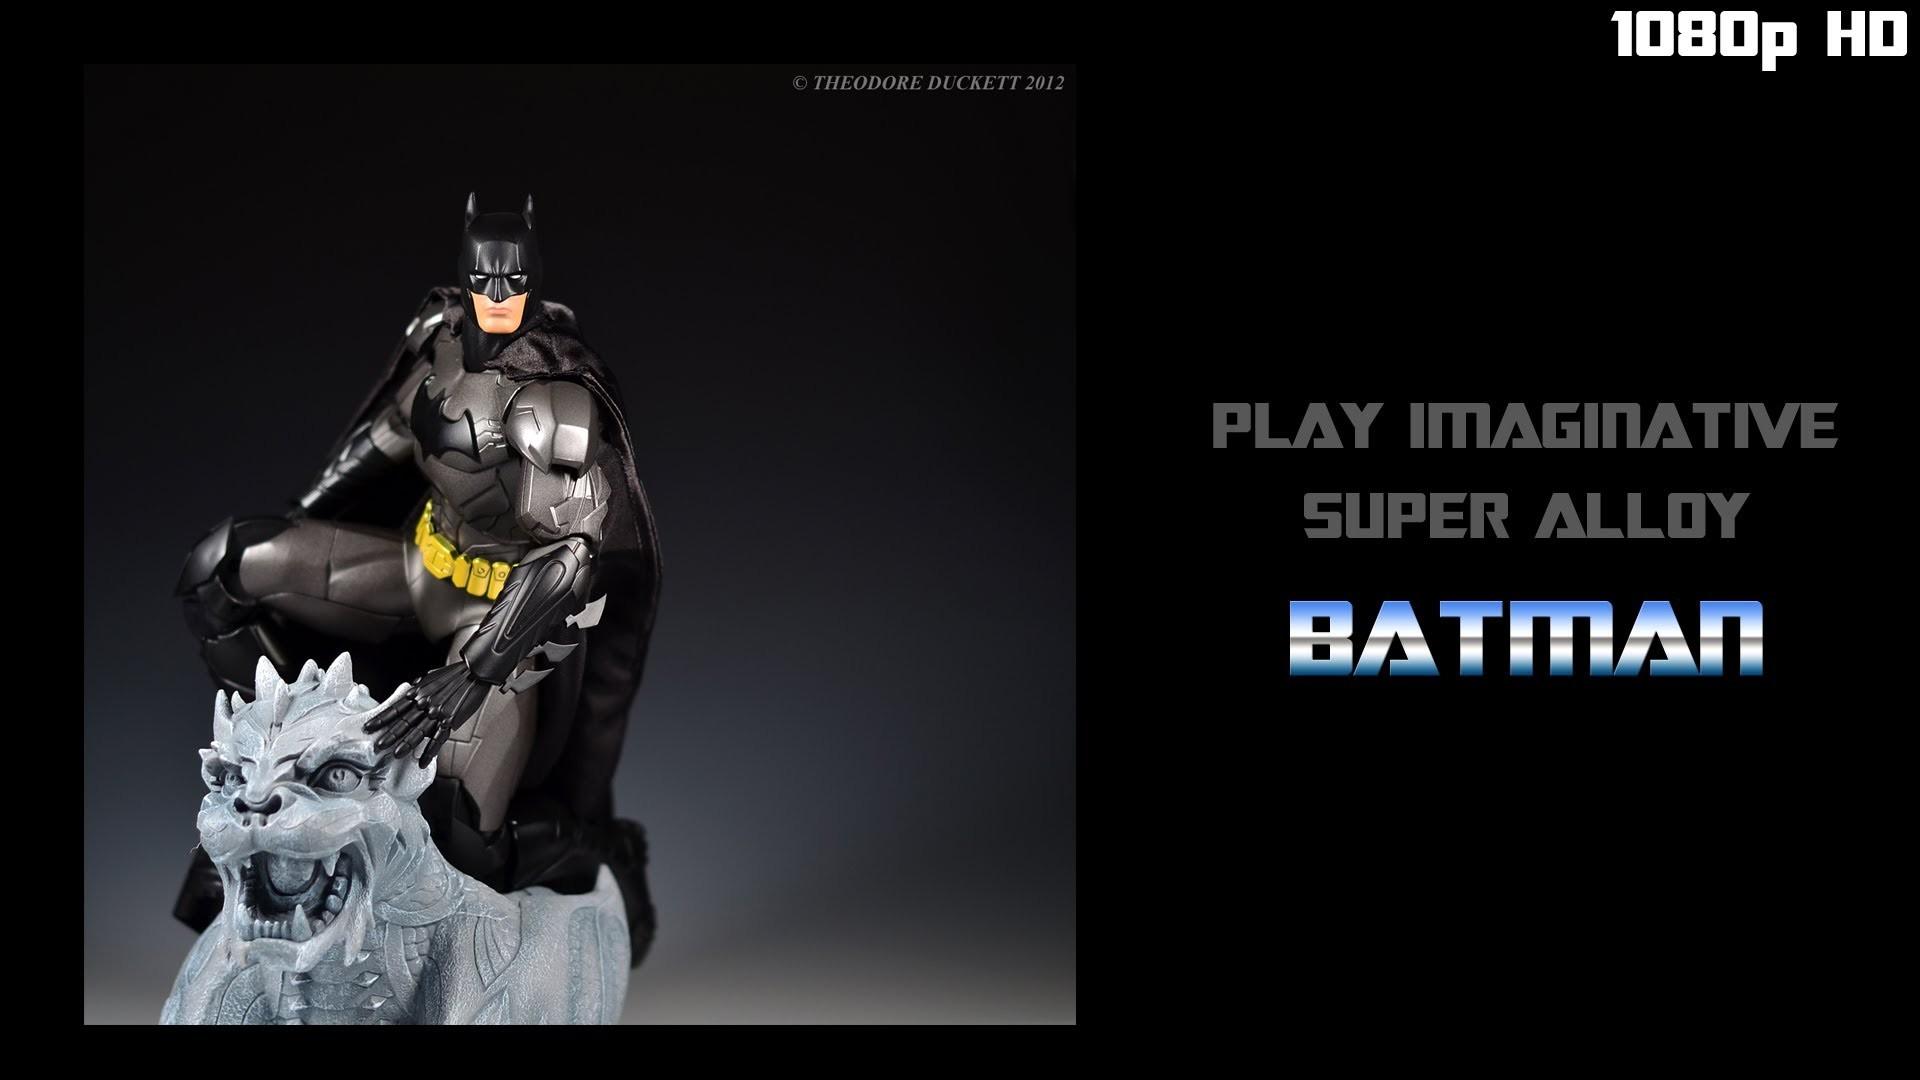 Toy Review: Play Imaginative 1/6th Super Alloy Batman (Jim Lee Edition)